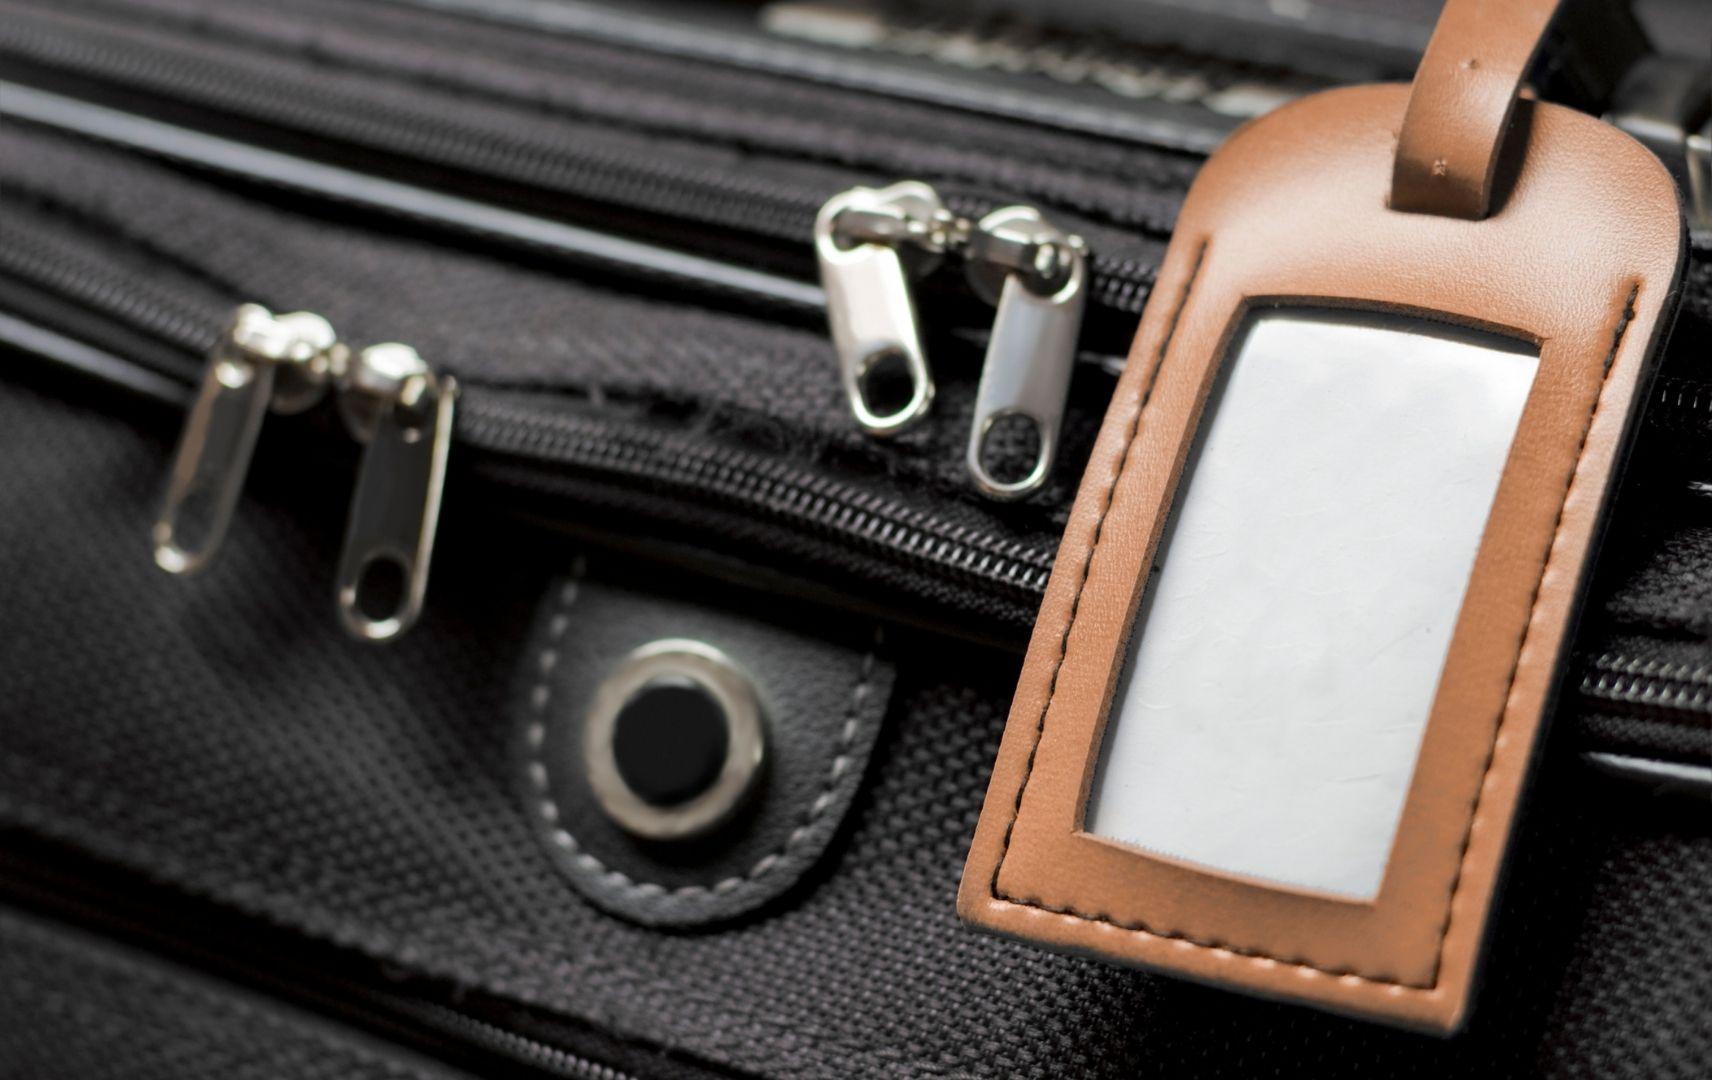 Packliste - Kofferanhänger am Koffer